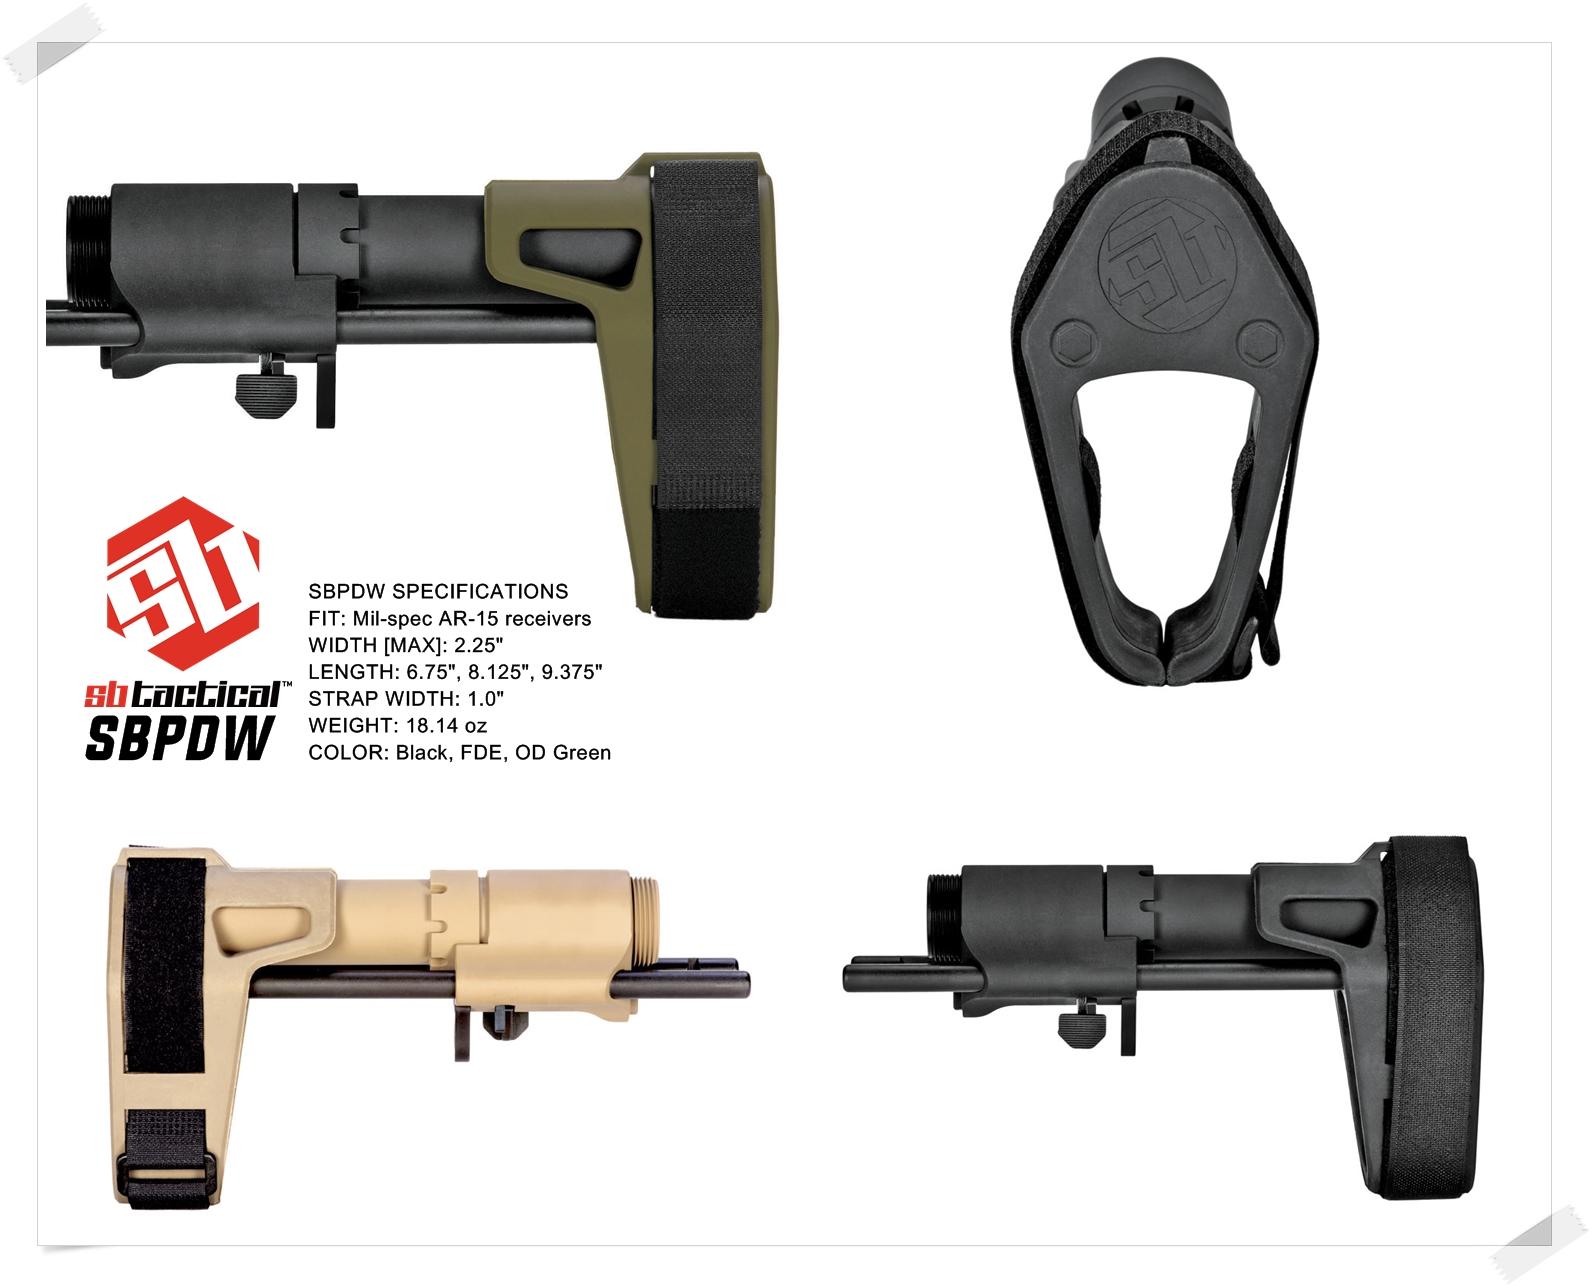 4-1 SB TACTICAL SB-PDW TYPE!! ちょっと気になって 購入~検証~DIY してみた!! STD電動ガン専用 M4 AR-15 スタビブレース バットストック & NOVESKE GEN3 MB専用 ポン付け ストック スリング プレート作製!!